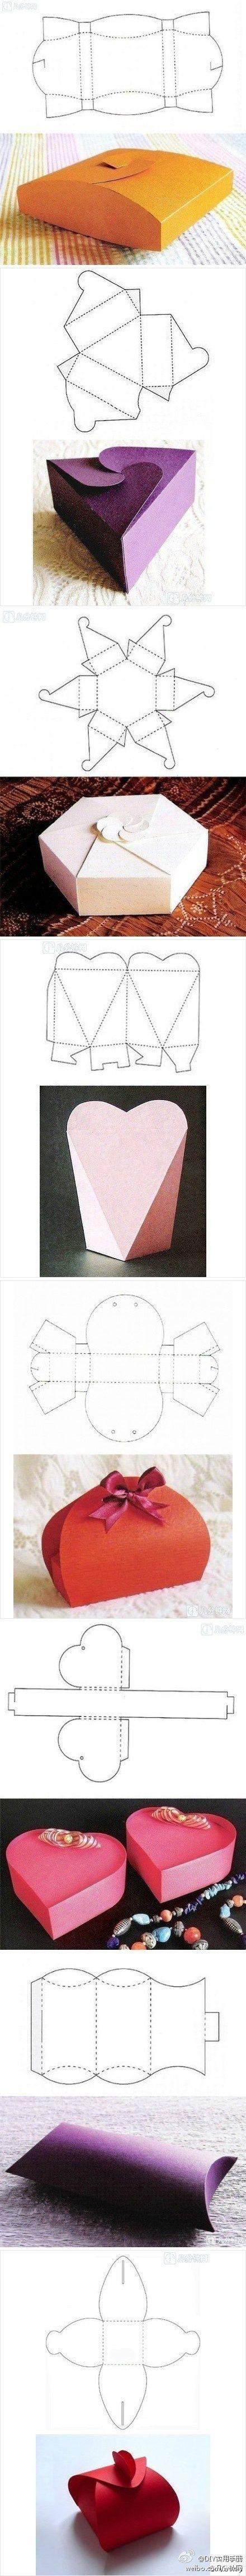 Homemade boxes good dIY gift box templates